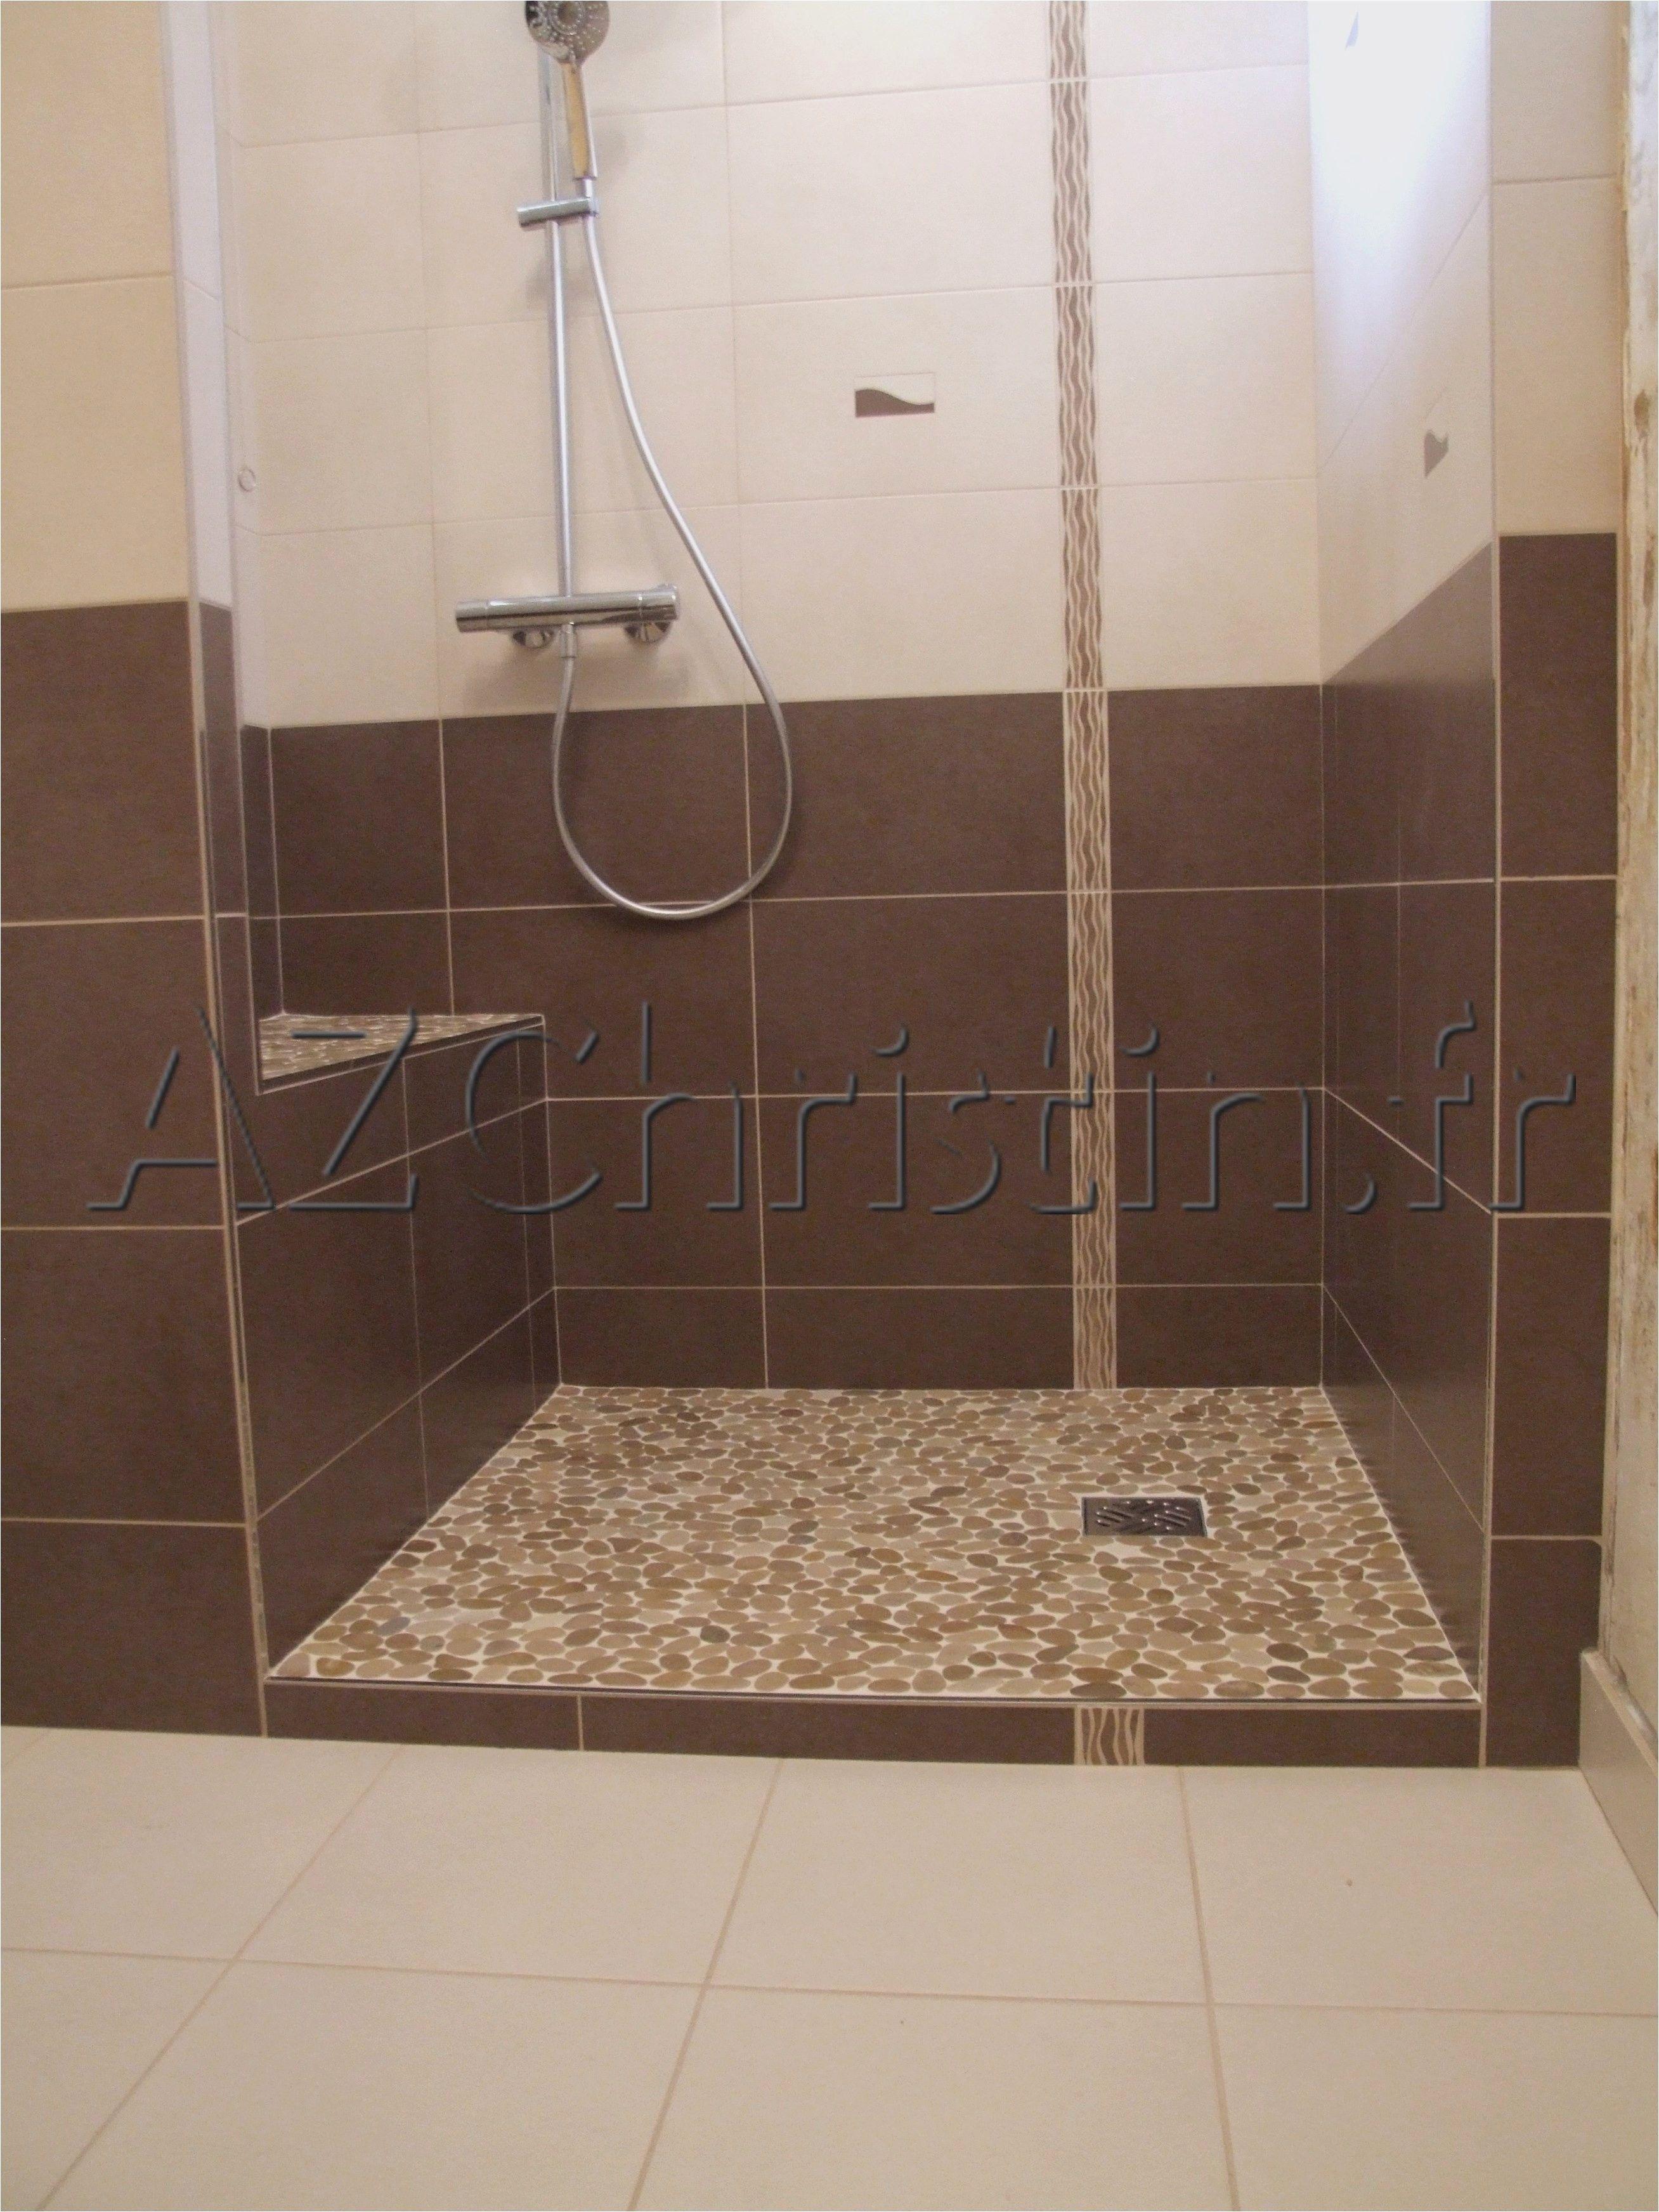 Elegant Faire Joint Silicone Douche Bathroom Douche Modern Bathroom Design